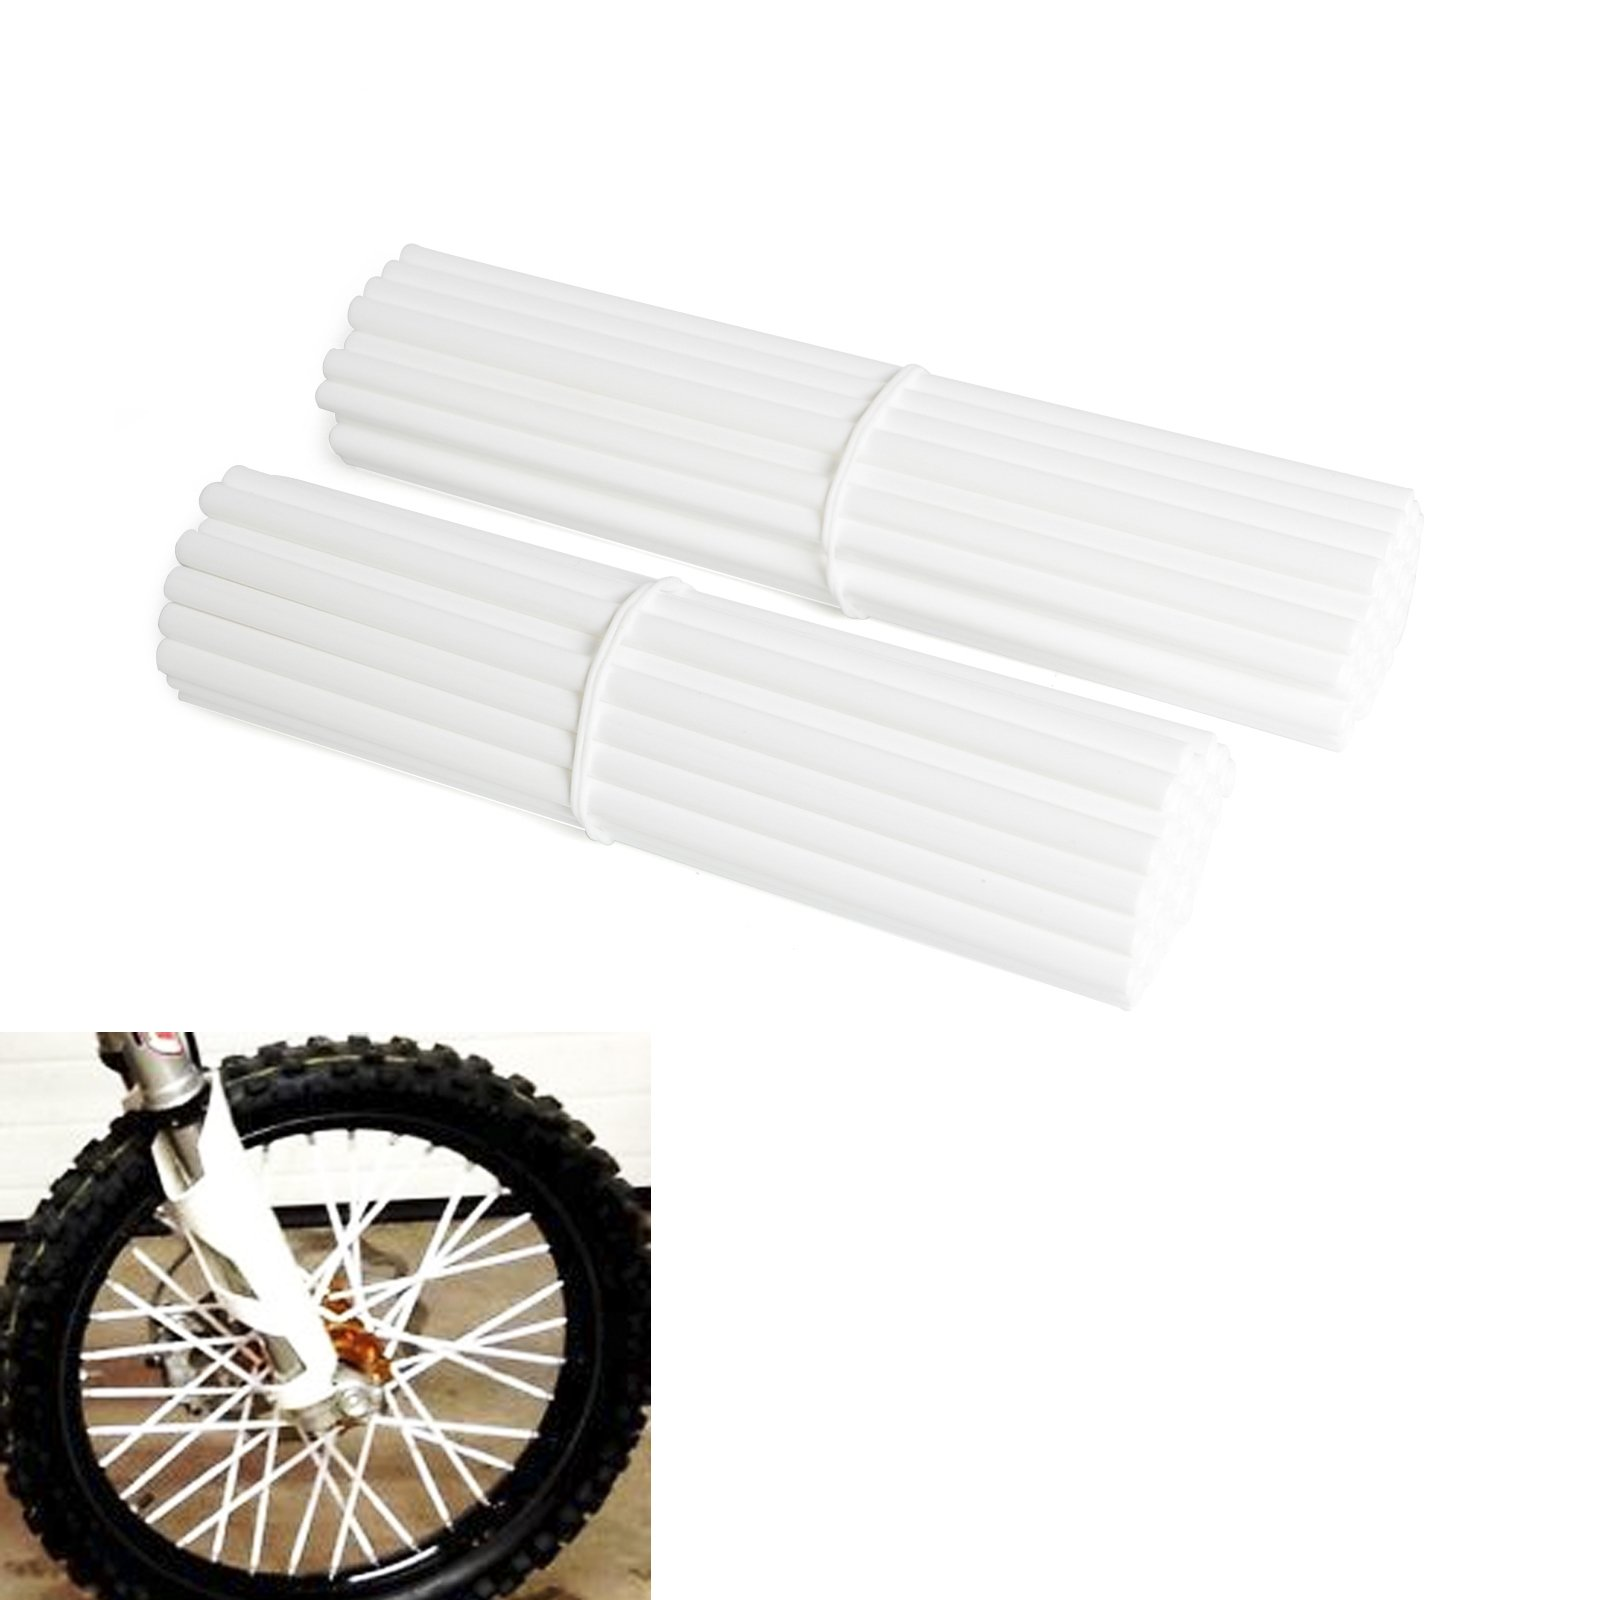 NICECNC White Spoke Wraps Covers for 17-21 Inches Wheel Dirt Bikes MX Enduro Supermoto